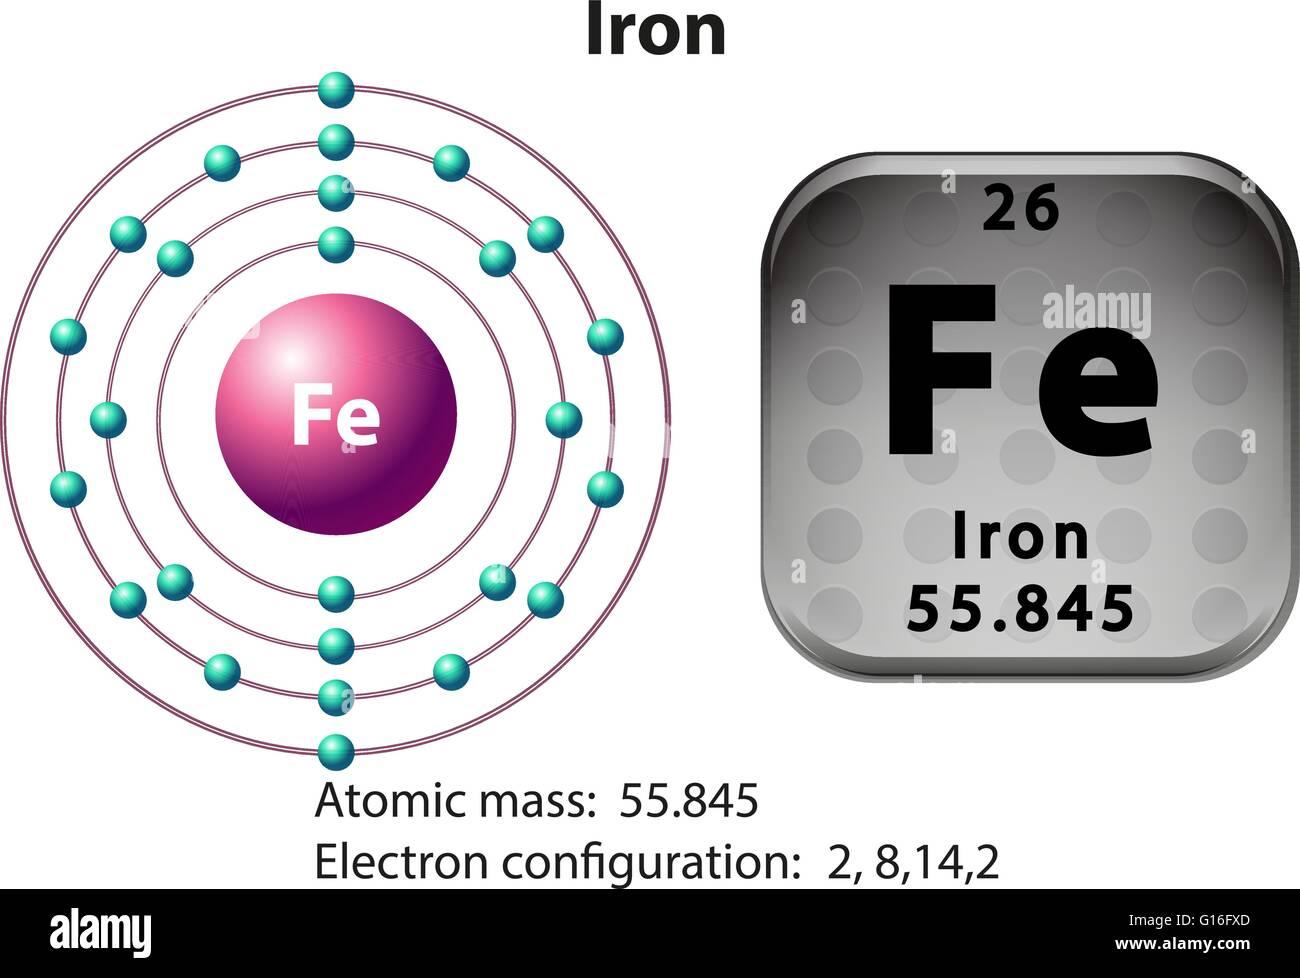 Symbol and electron diagram for iron illustration stock vector art symbol and electron diagram for iron illustration buycottarizona Image collections